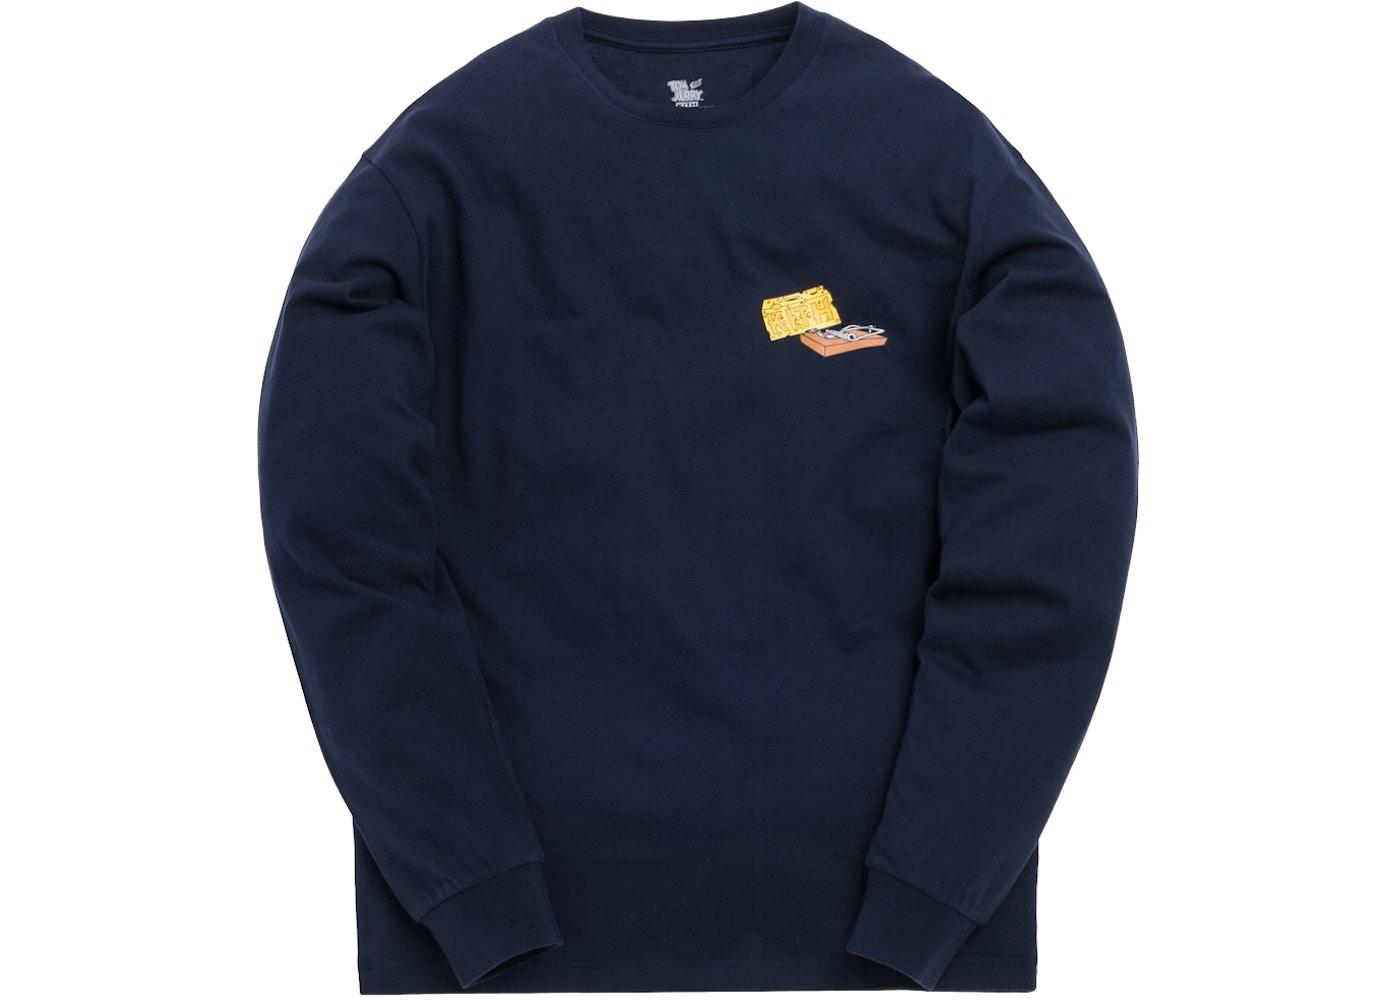 be52a68c Kith x Tom & Jerry L/S Cheese Tee Navy - SS19